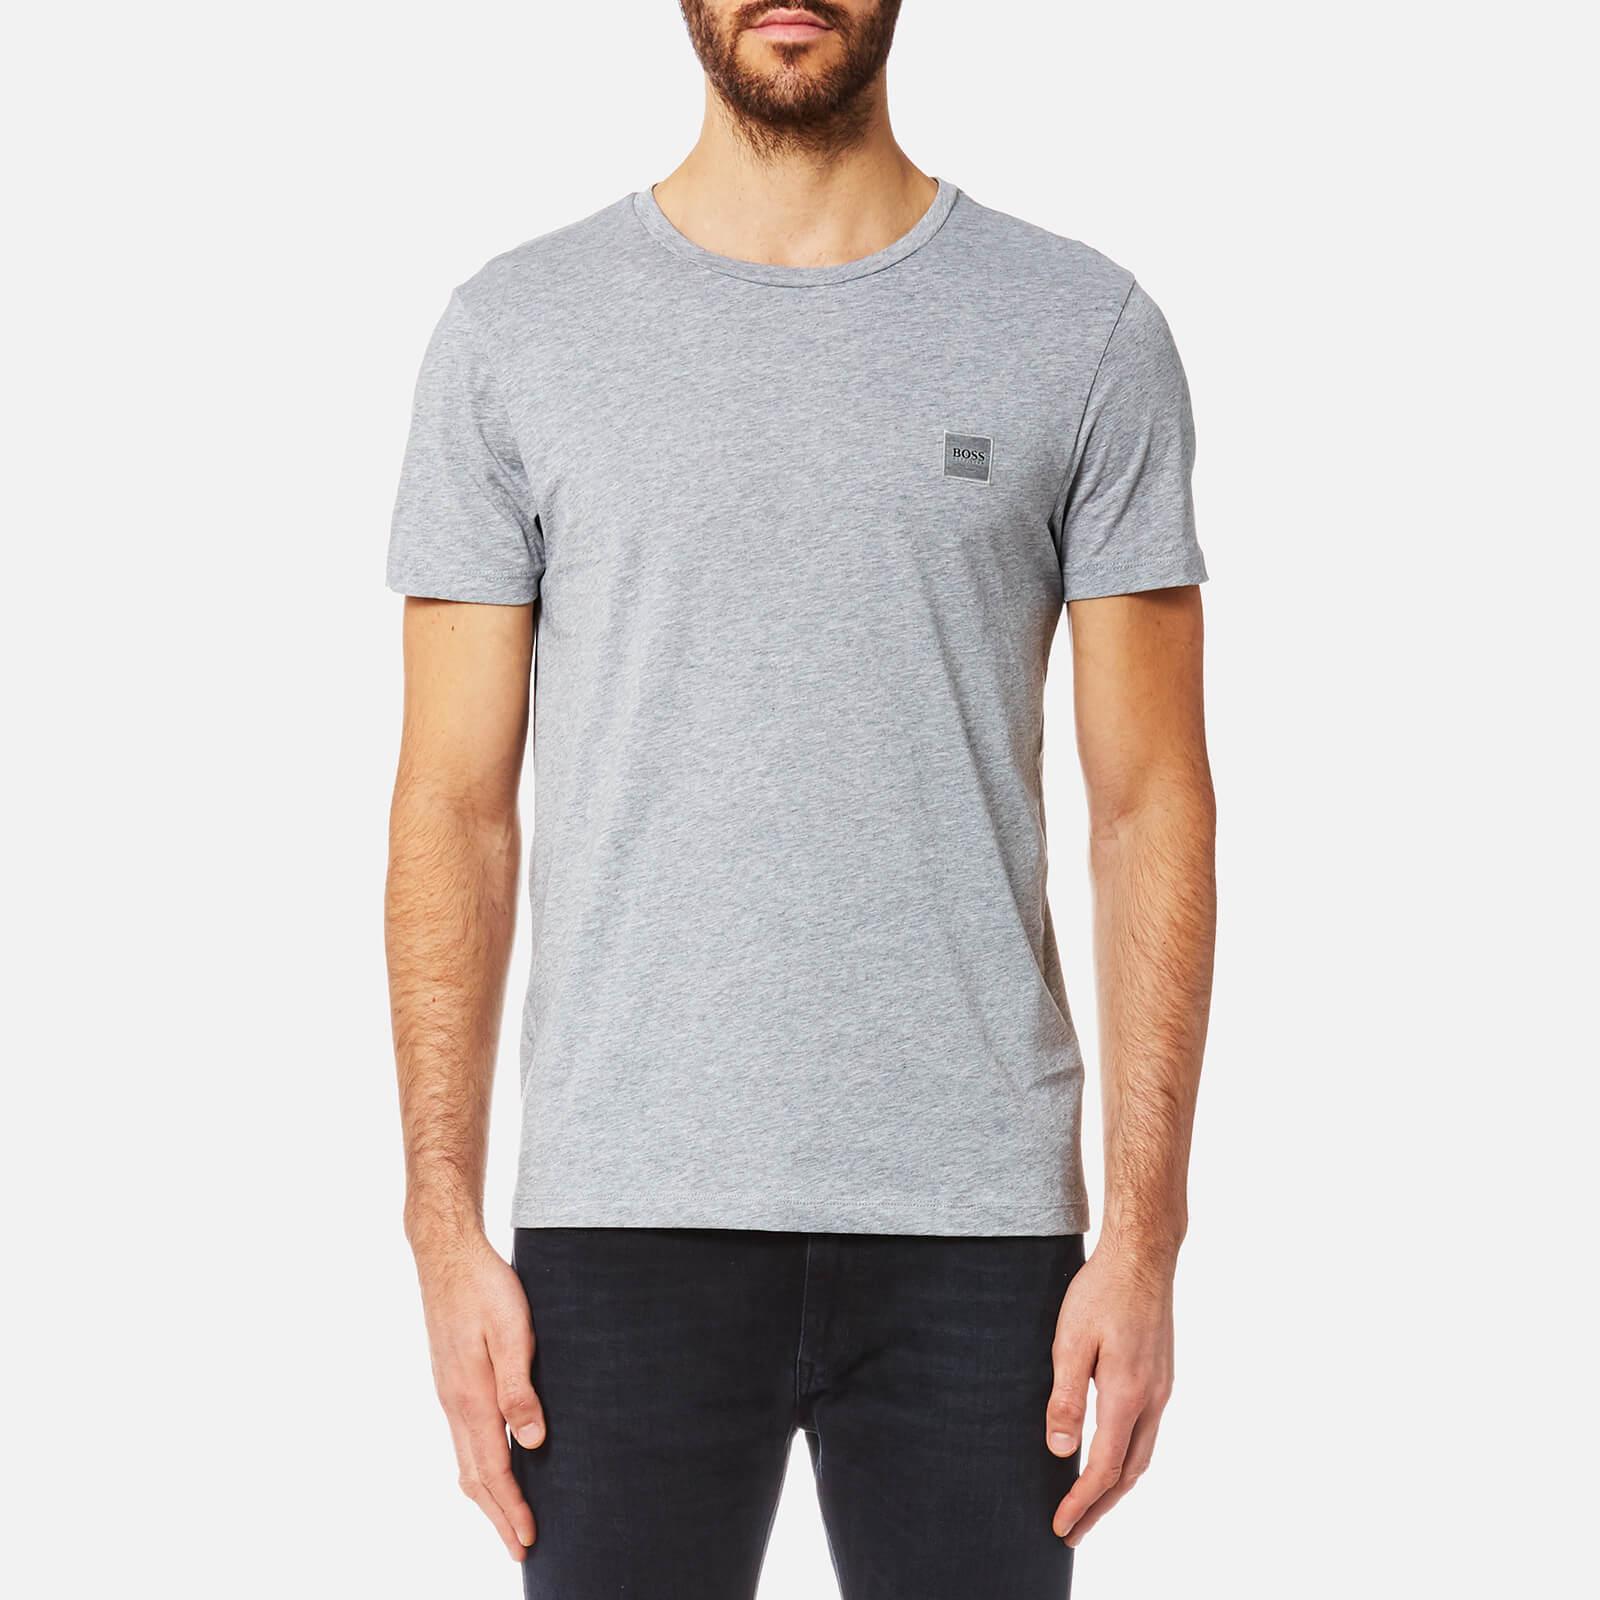 df166fdc9 BOSS Orange Men's Tommi Crew Neck T-Shirt - Medium Grey - Free UK Delivery  over £50